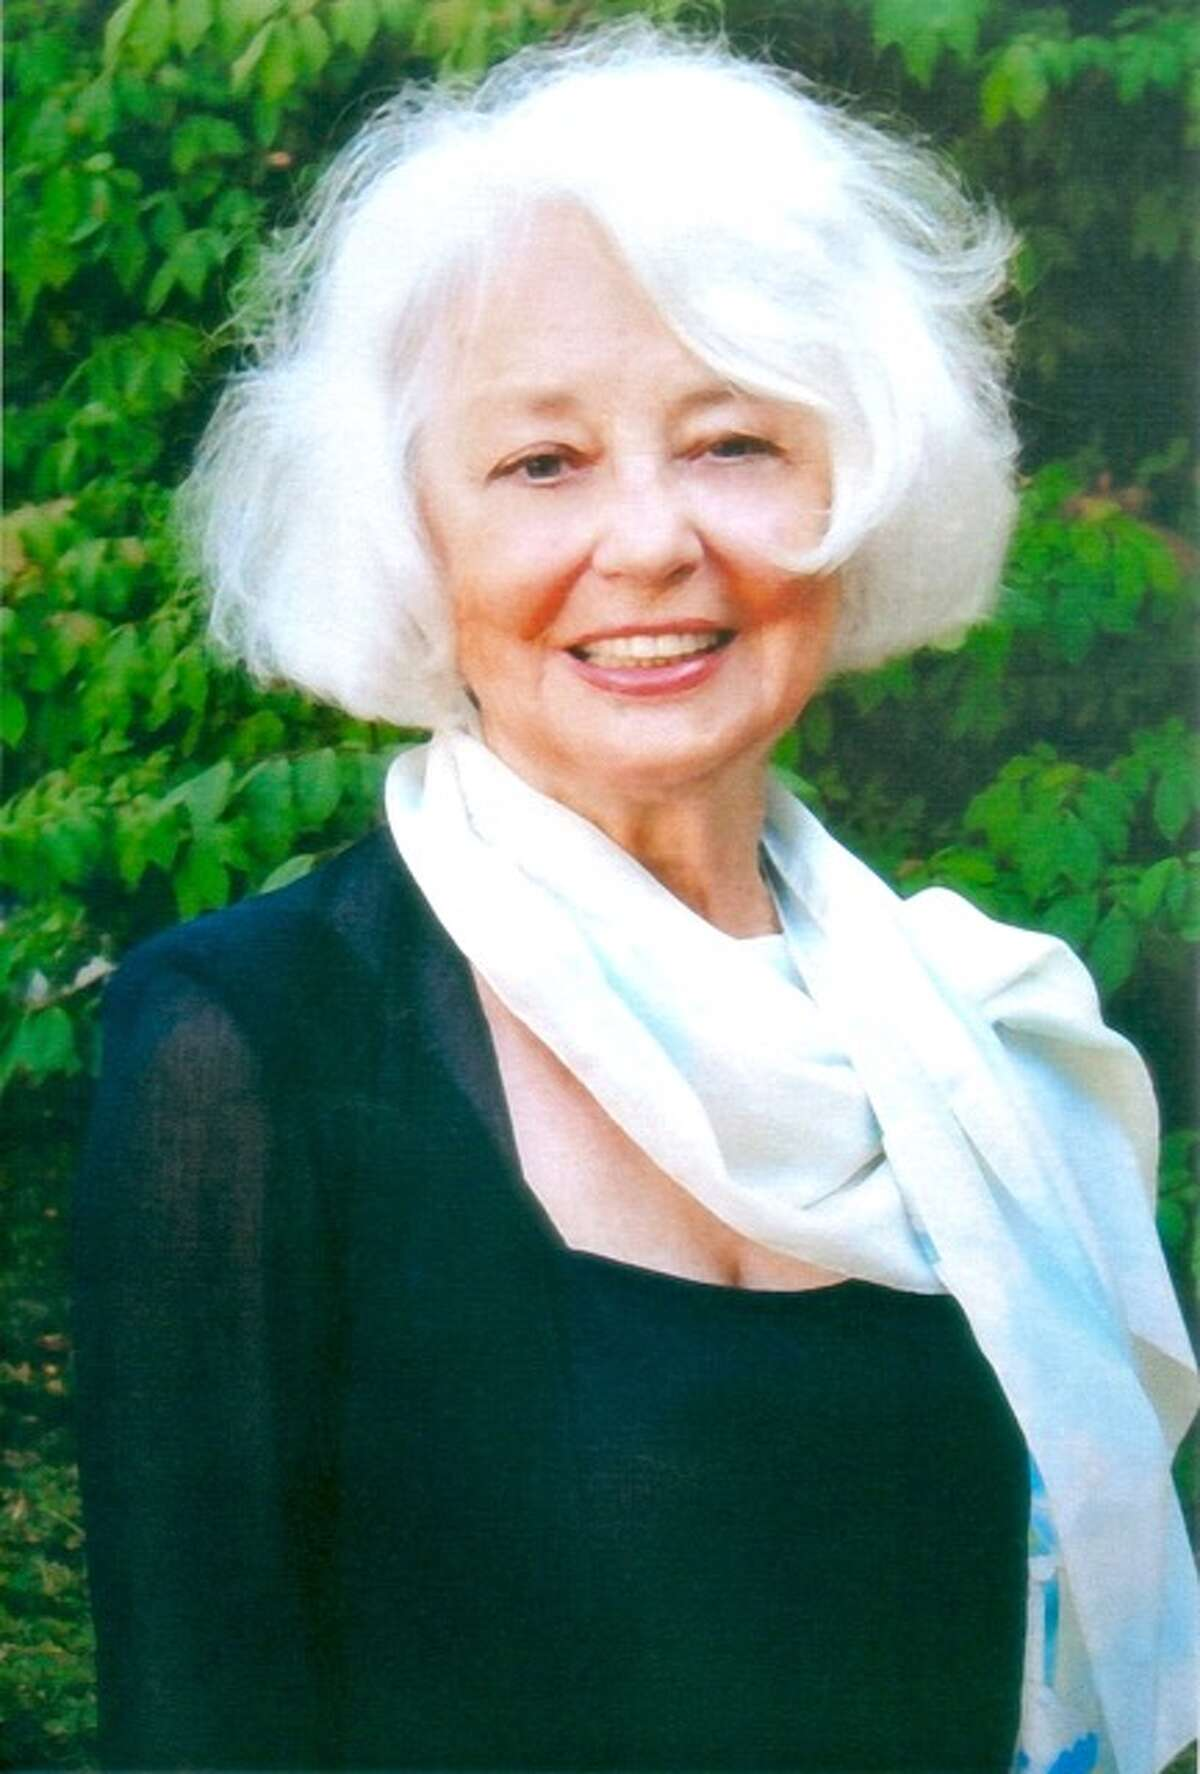 Ursula Garreau Rickenbacher, founder of Ursula of Switzerland. Photo provided.